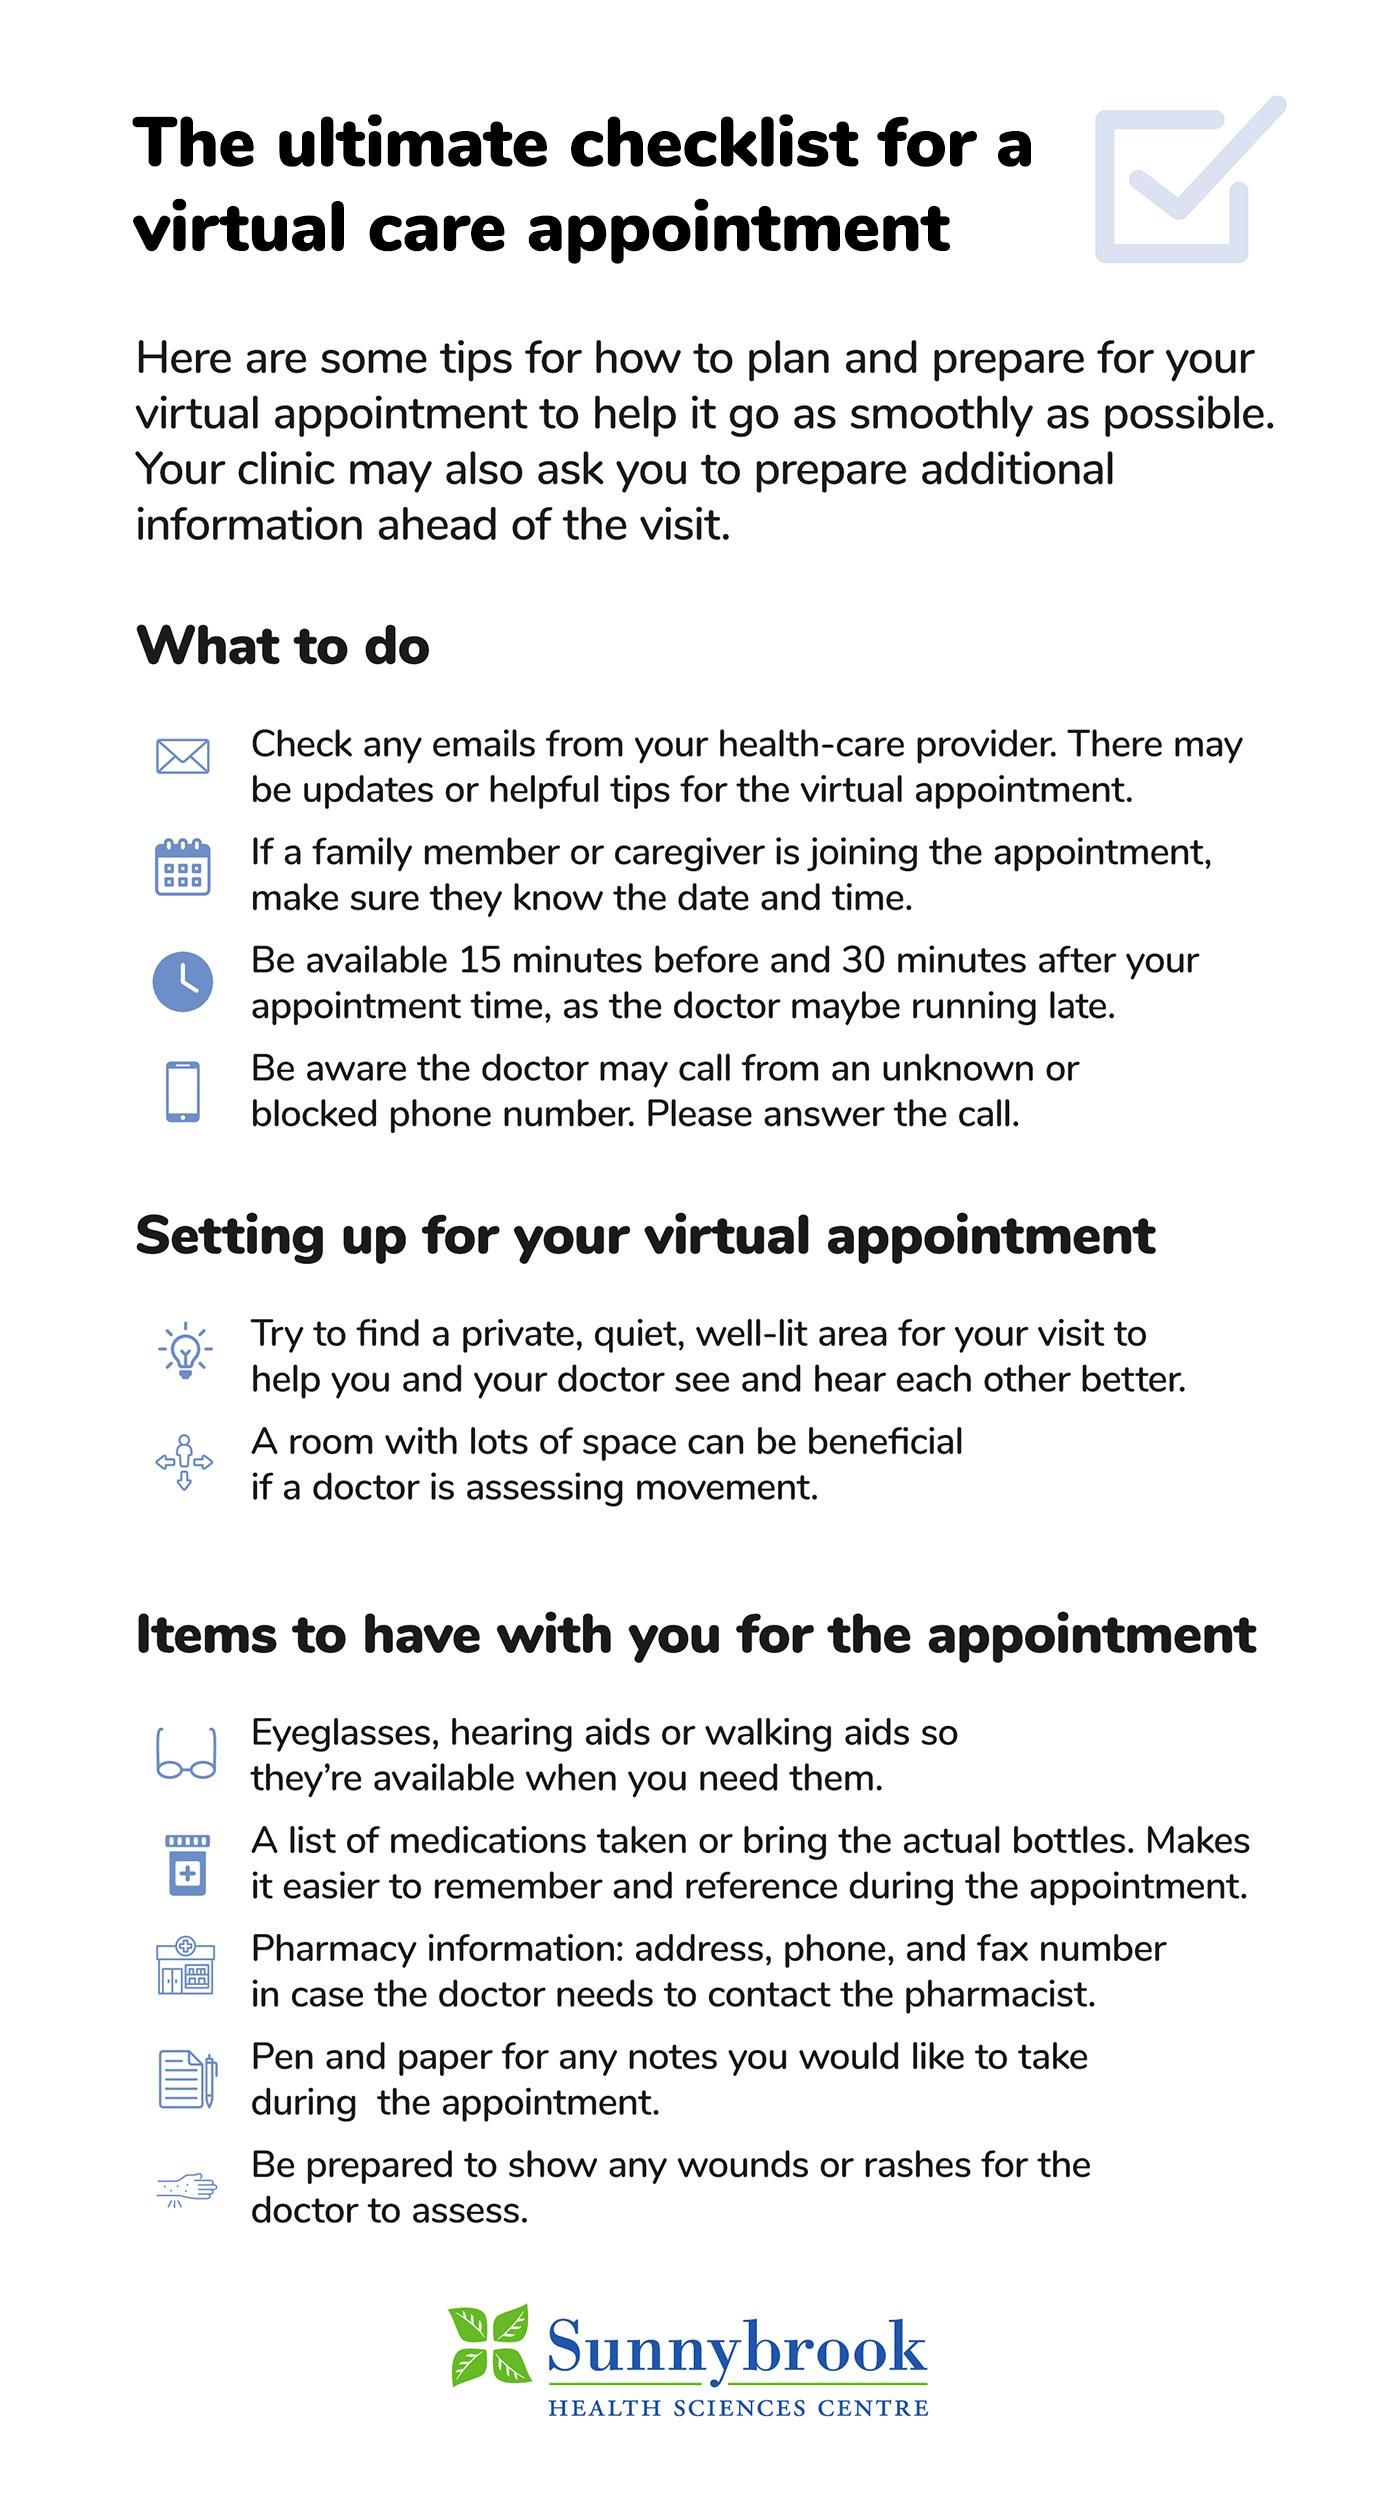 Virtual care checklist infographic. Text version below.